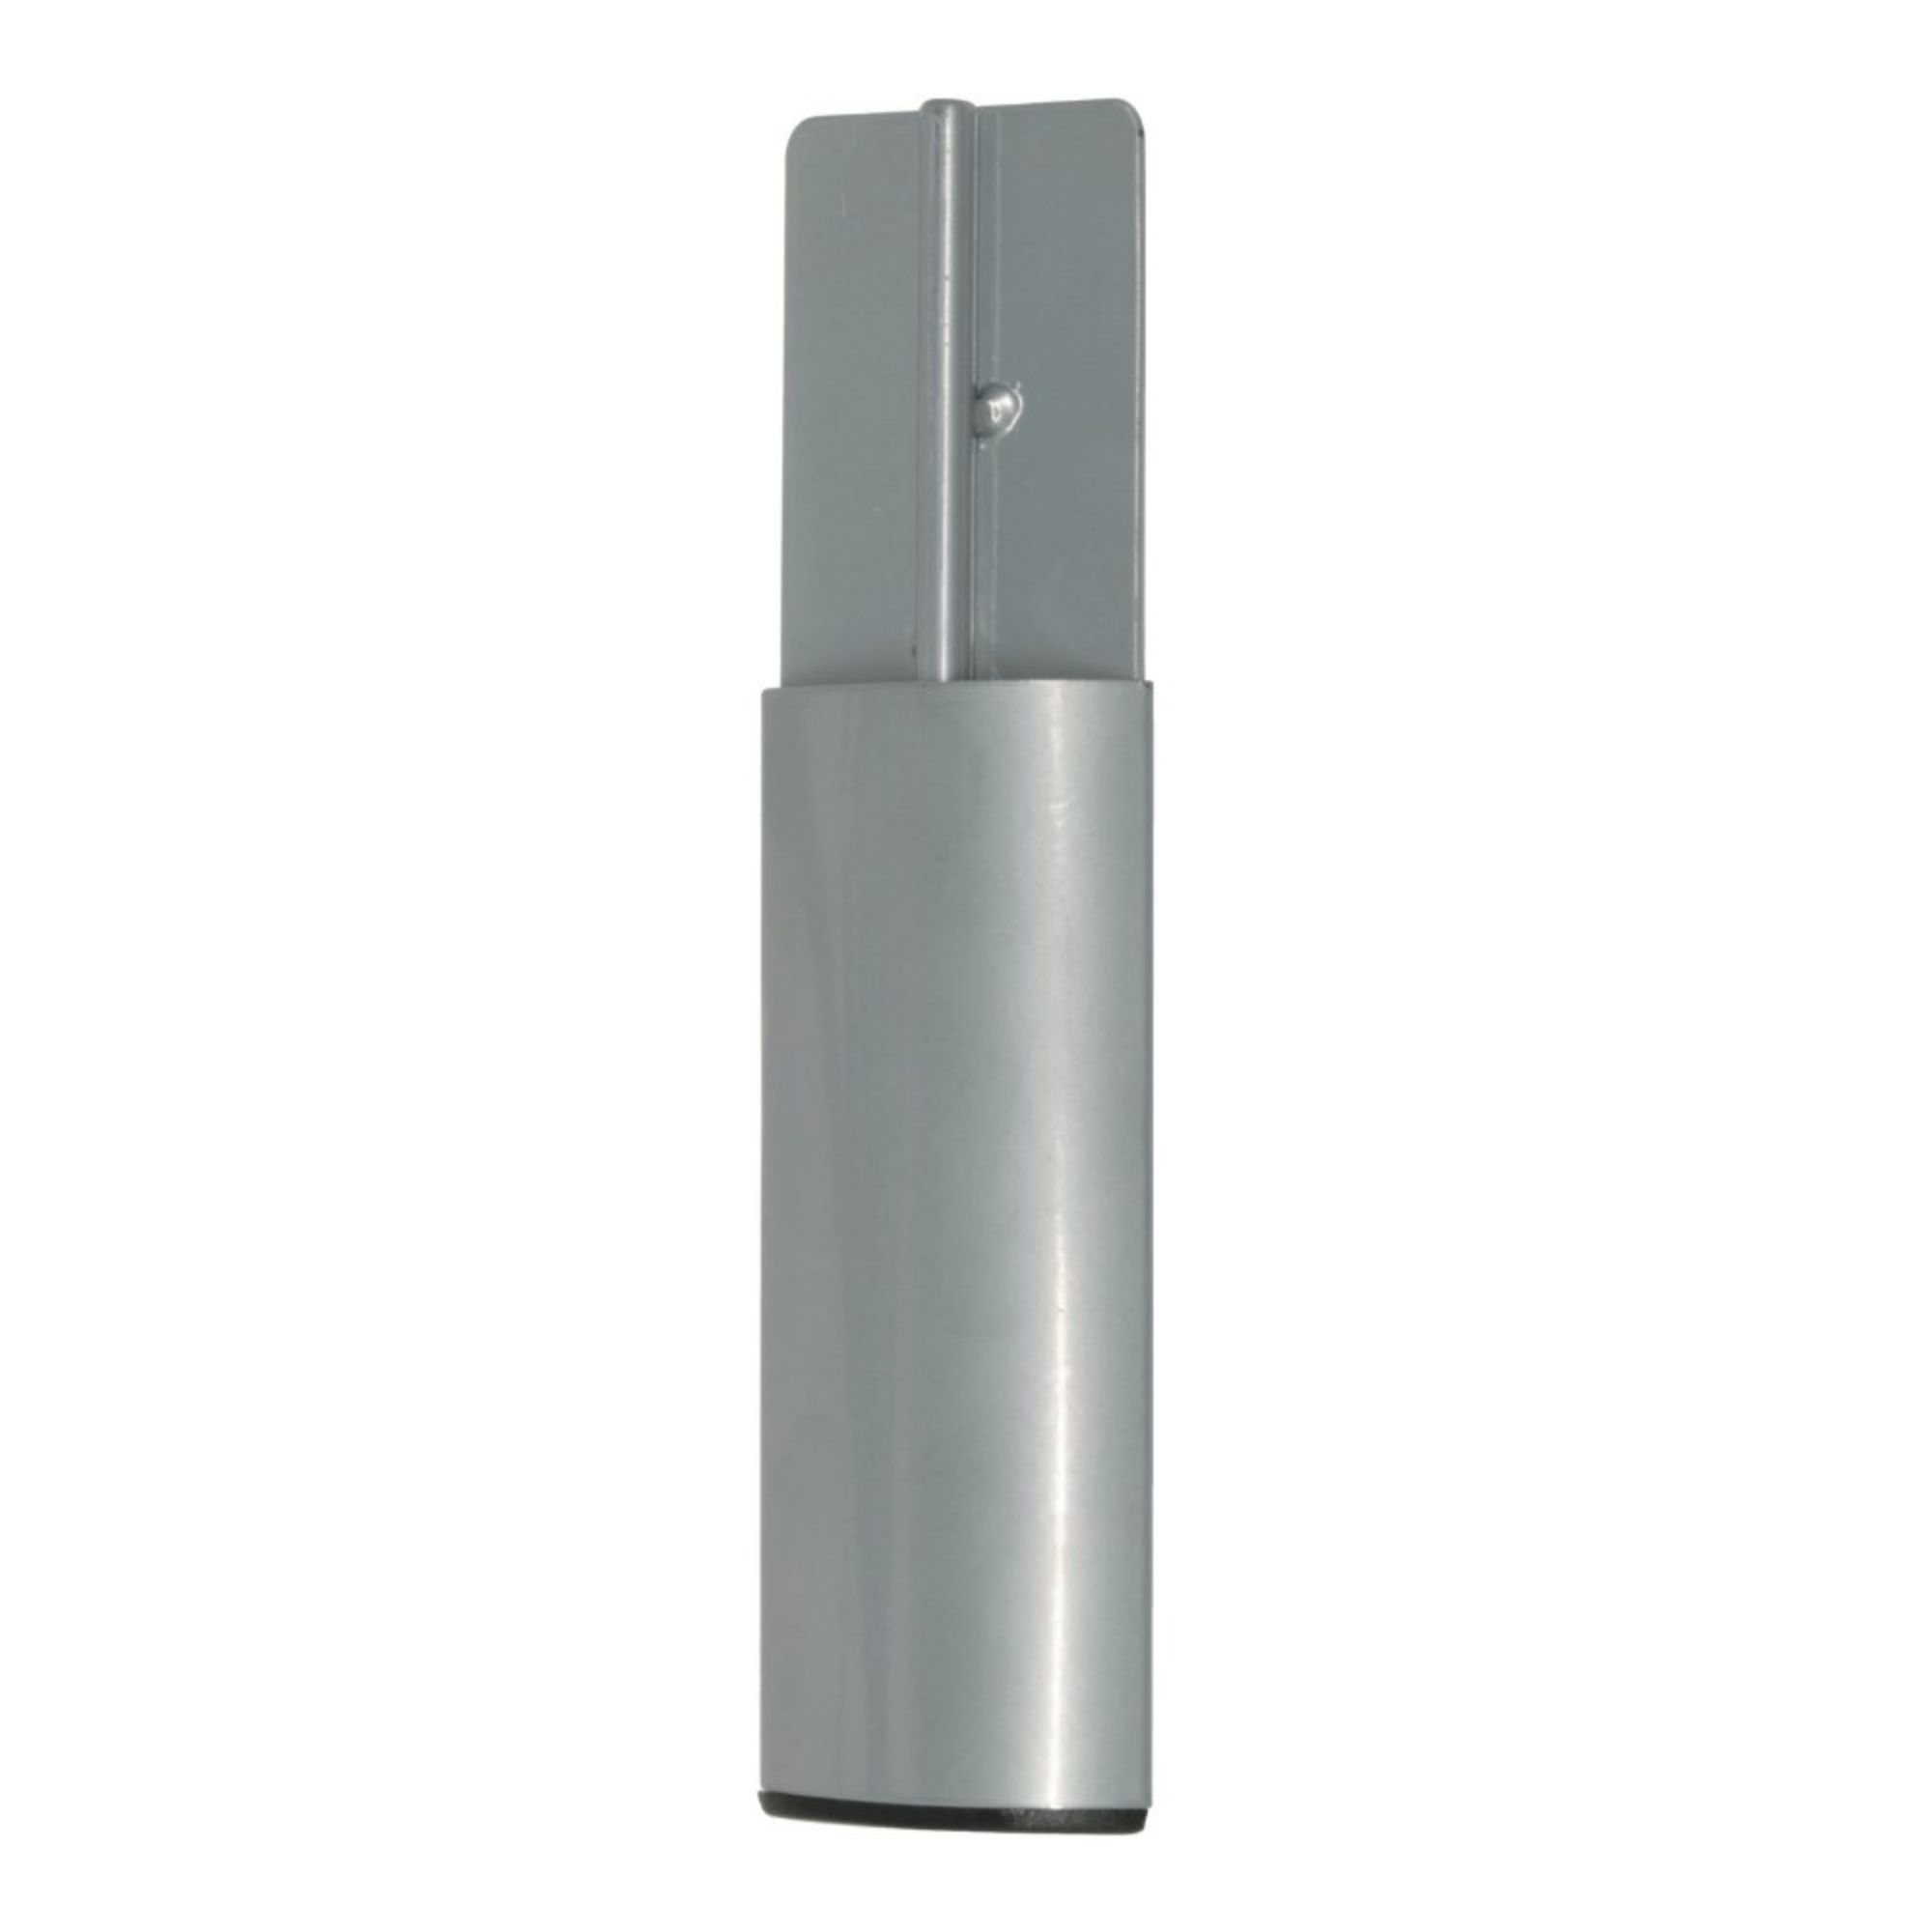 Offex Futura Leg Extension (Silver)